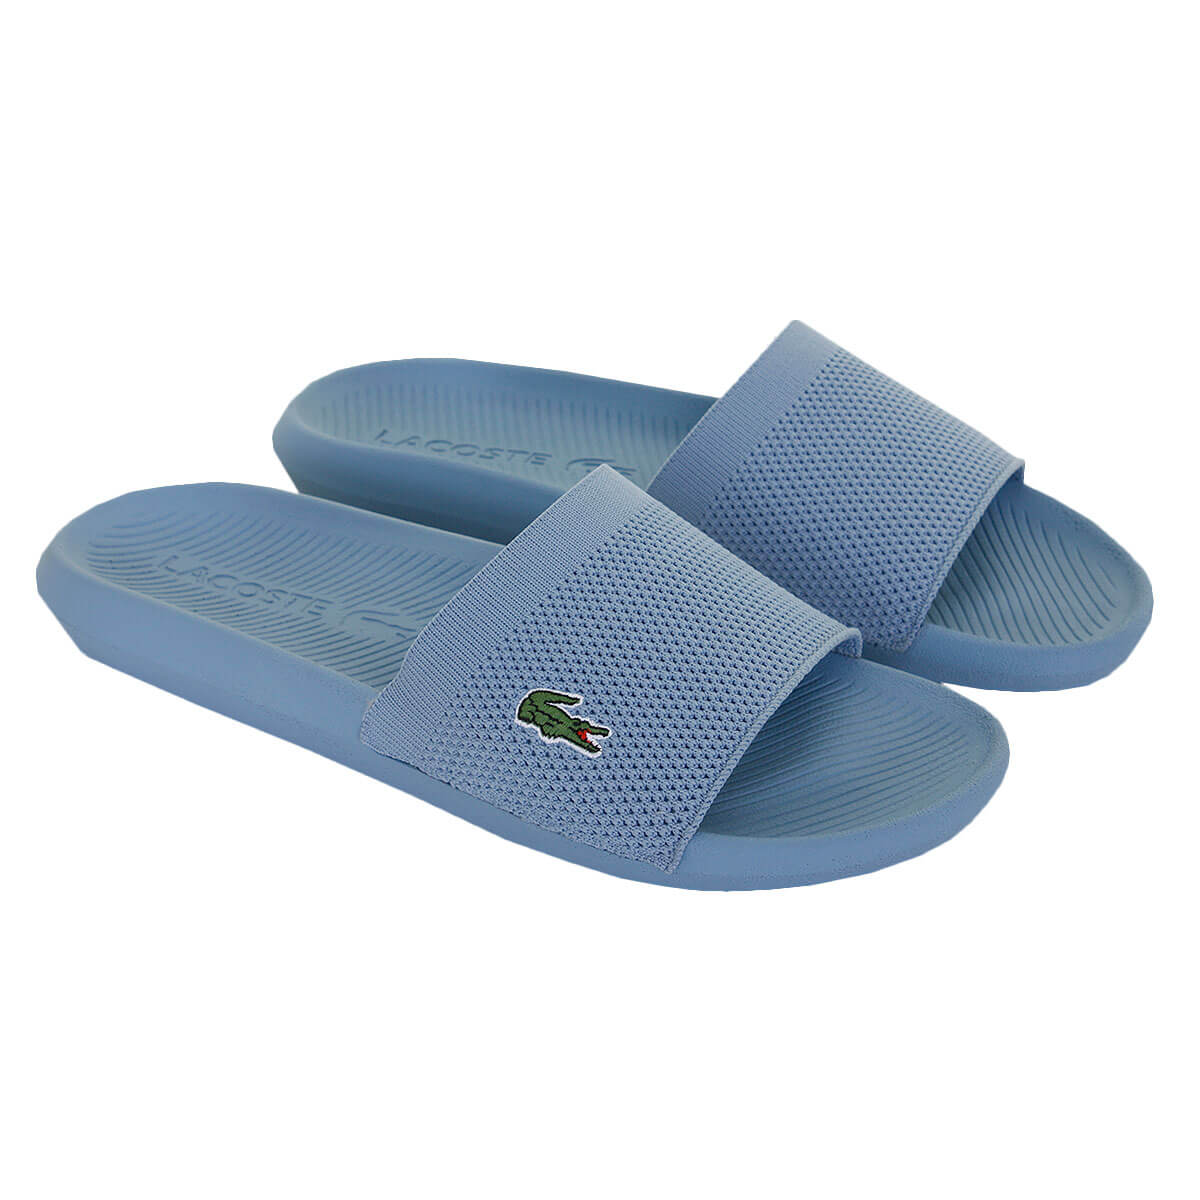 Lacoste-Mens-2019-Croco-Slide-219-2-US-CMA-Flip-Flops miniature 7